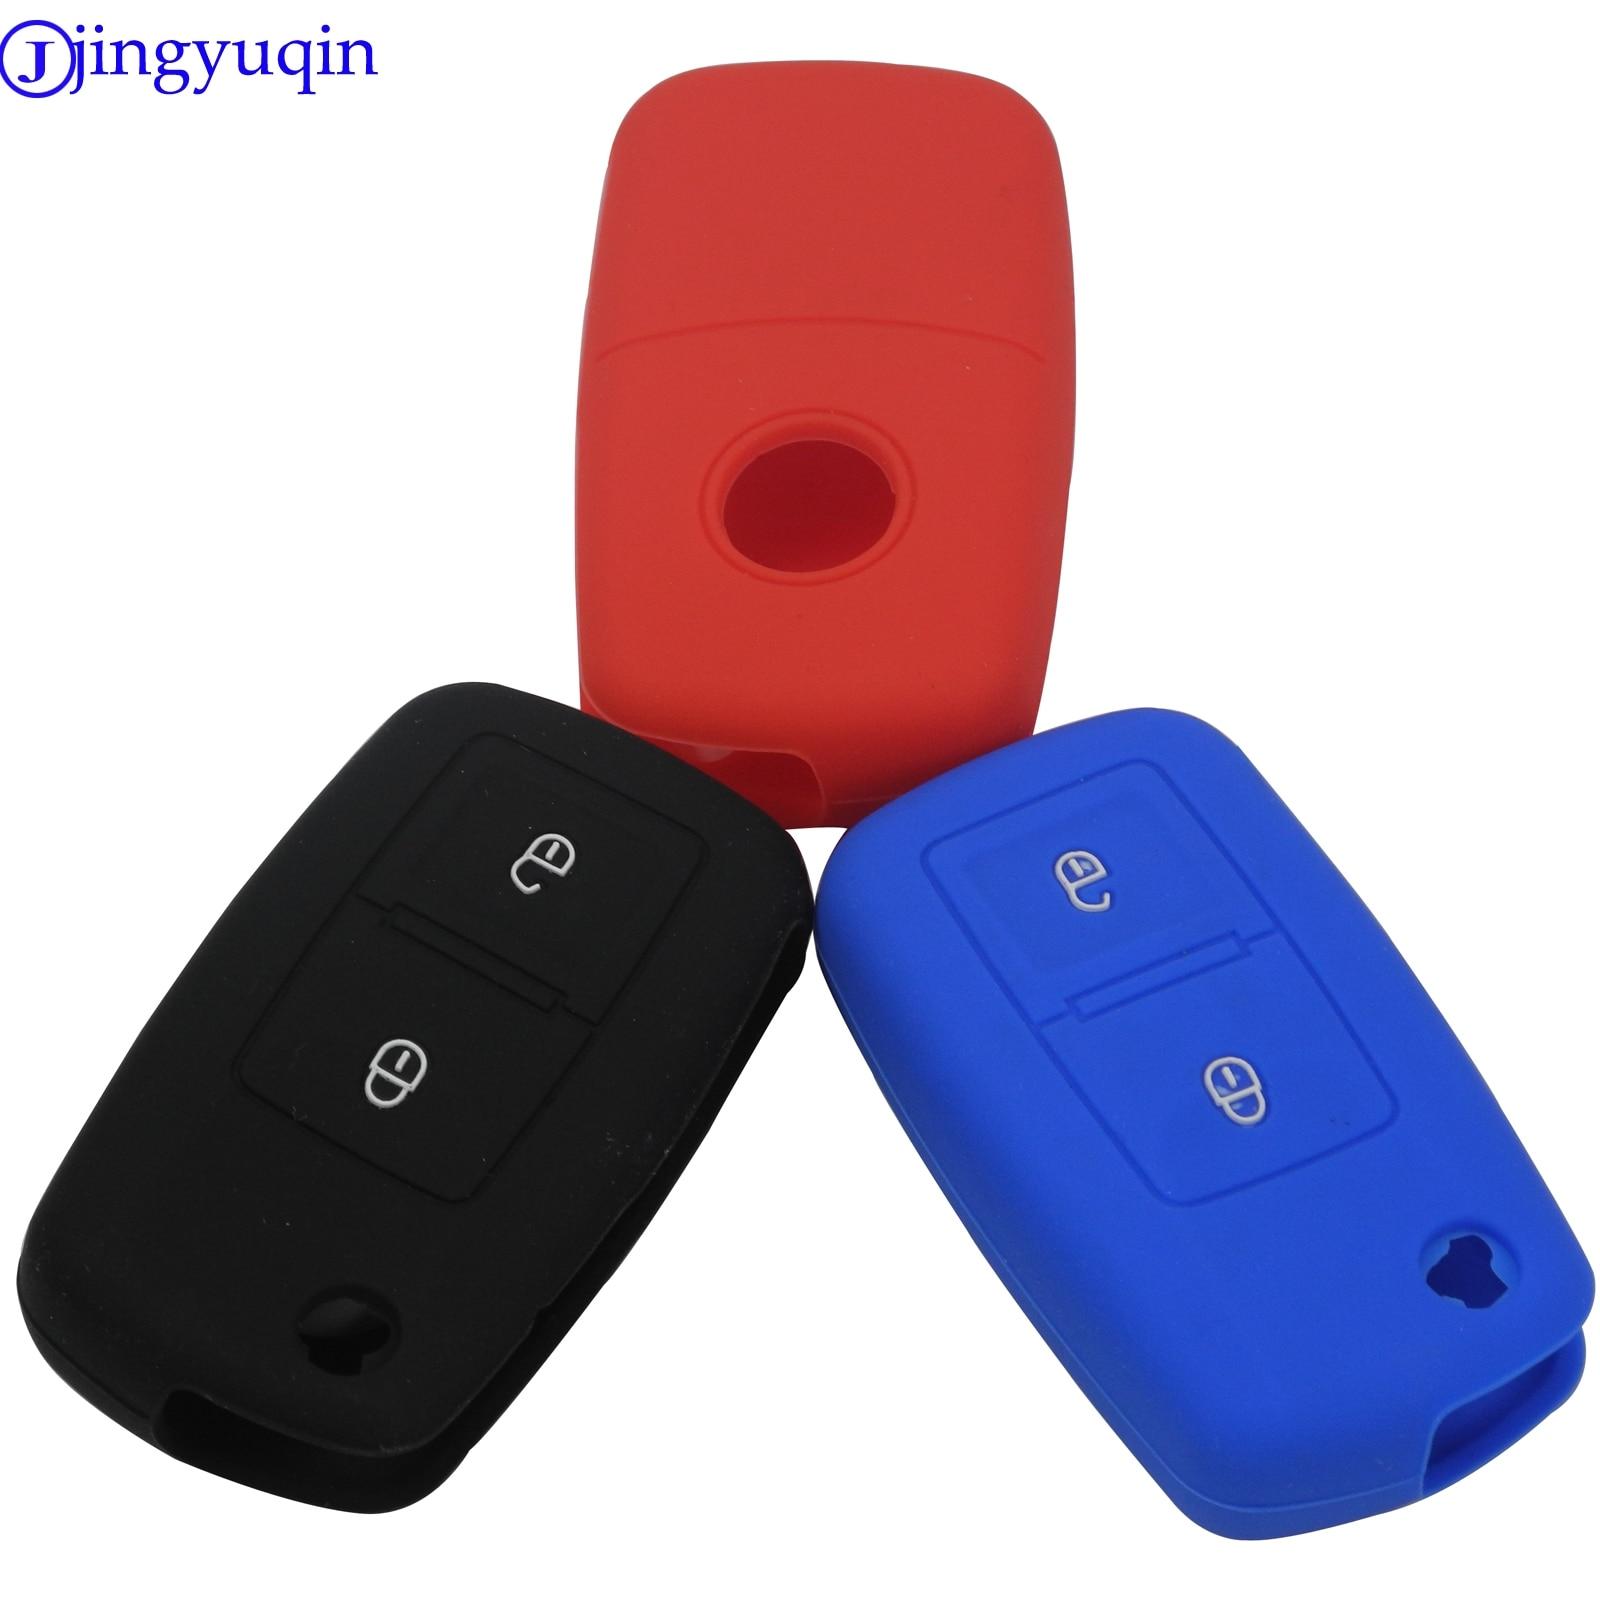 2 Button Silicone  Key Case Key Cover For VOLKSWAGEN VW MK4 Seat Altea Alhambra Ibiza Polo Golf 4 5 6 Transporter Amarok Sharan